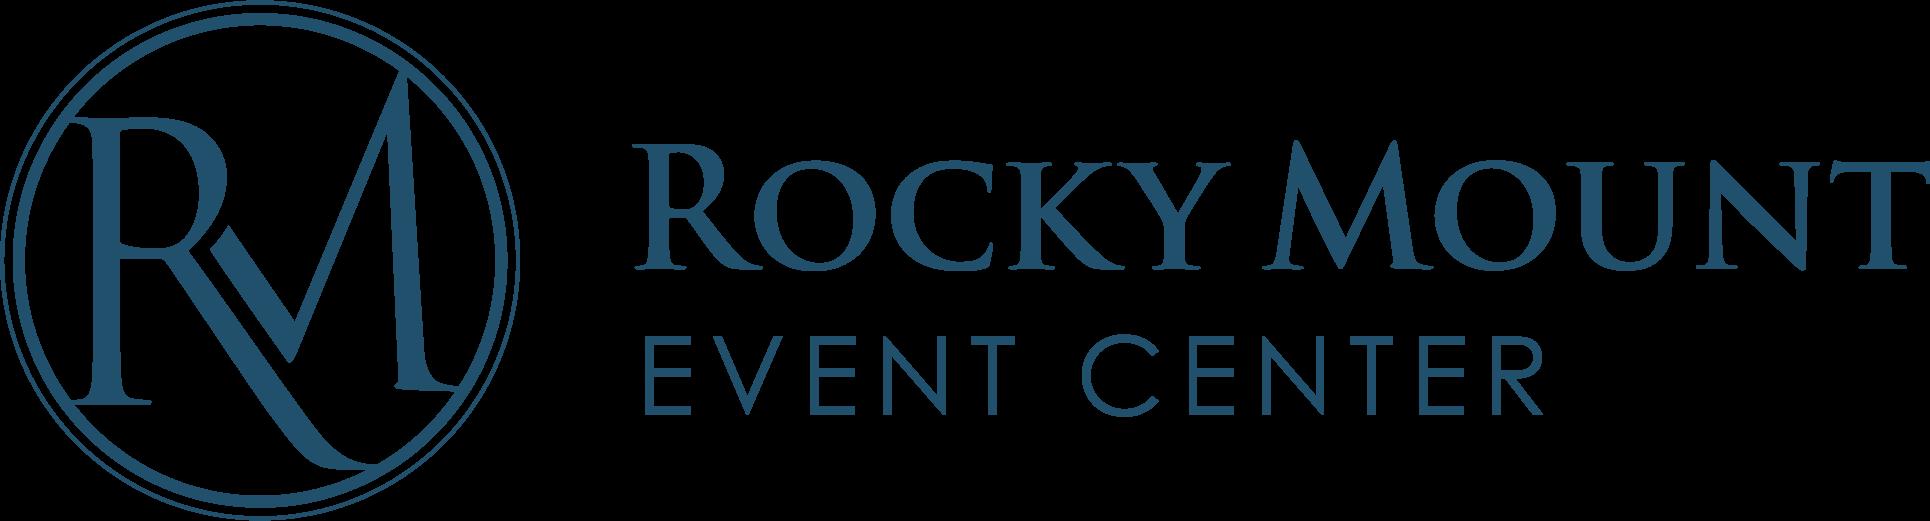 rocky mount event center logo